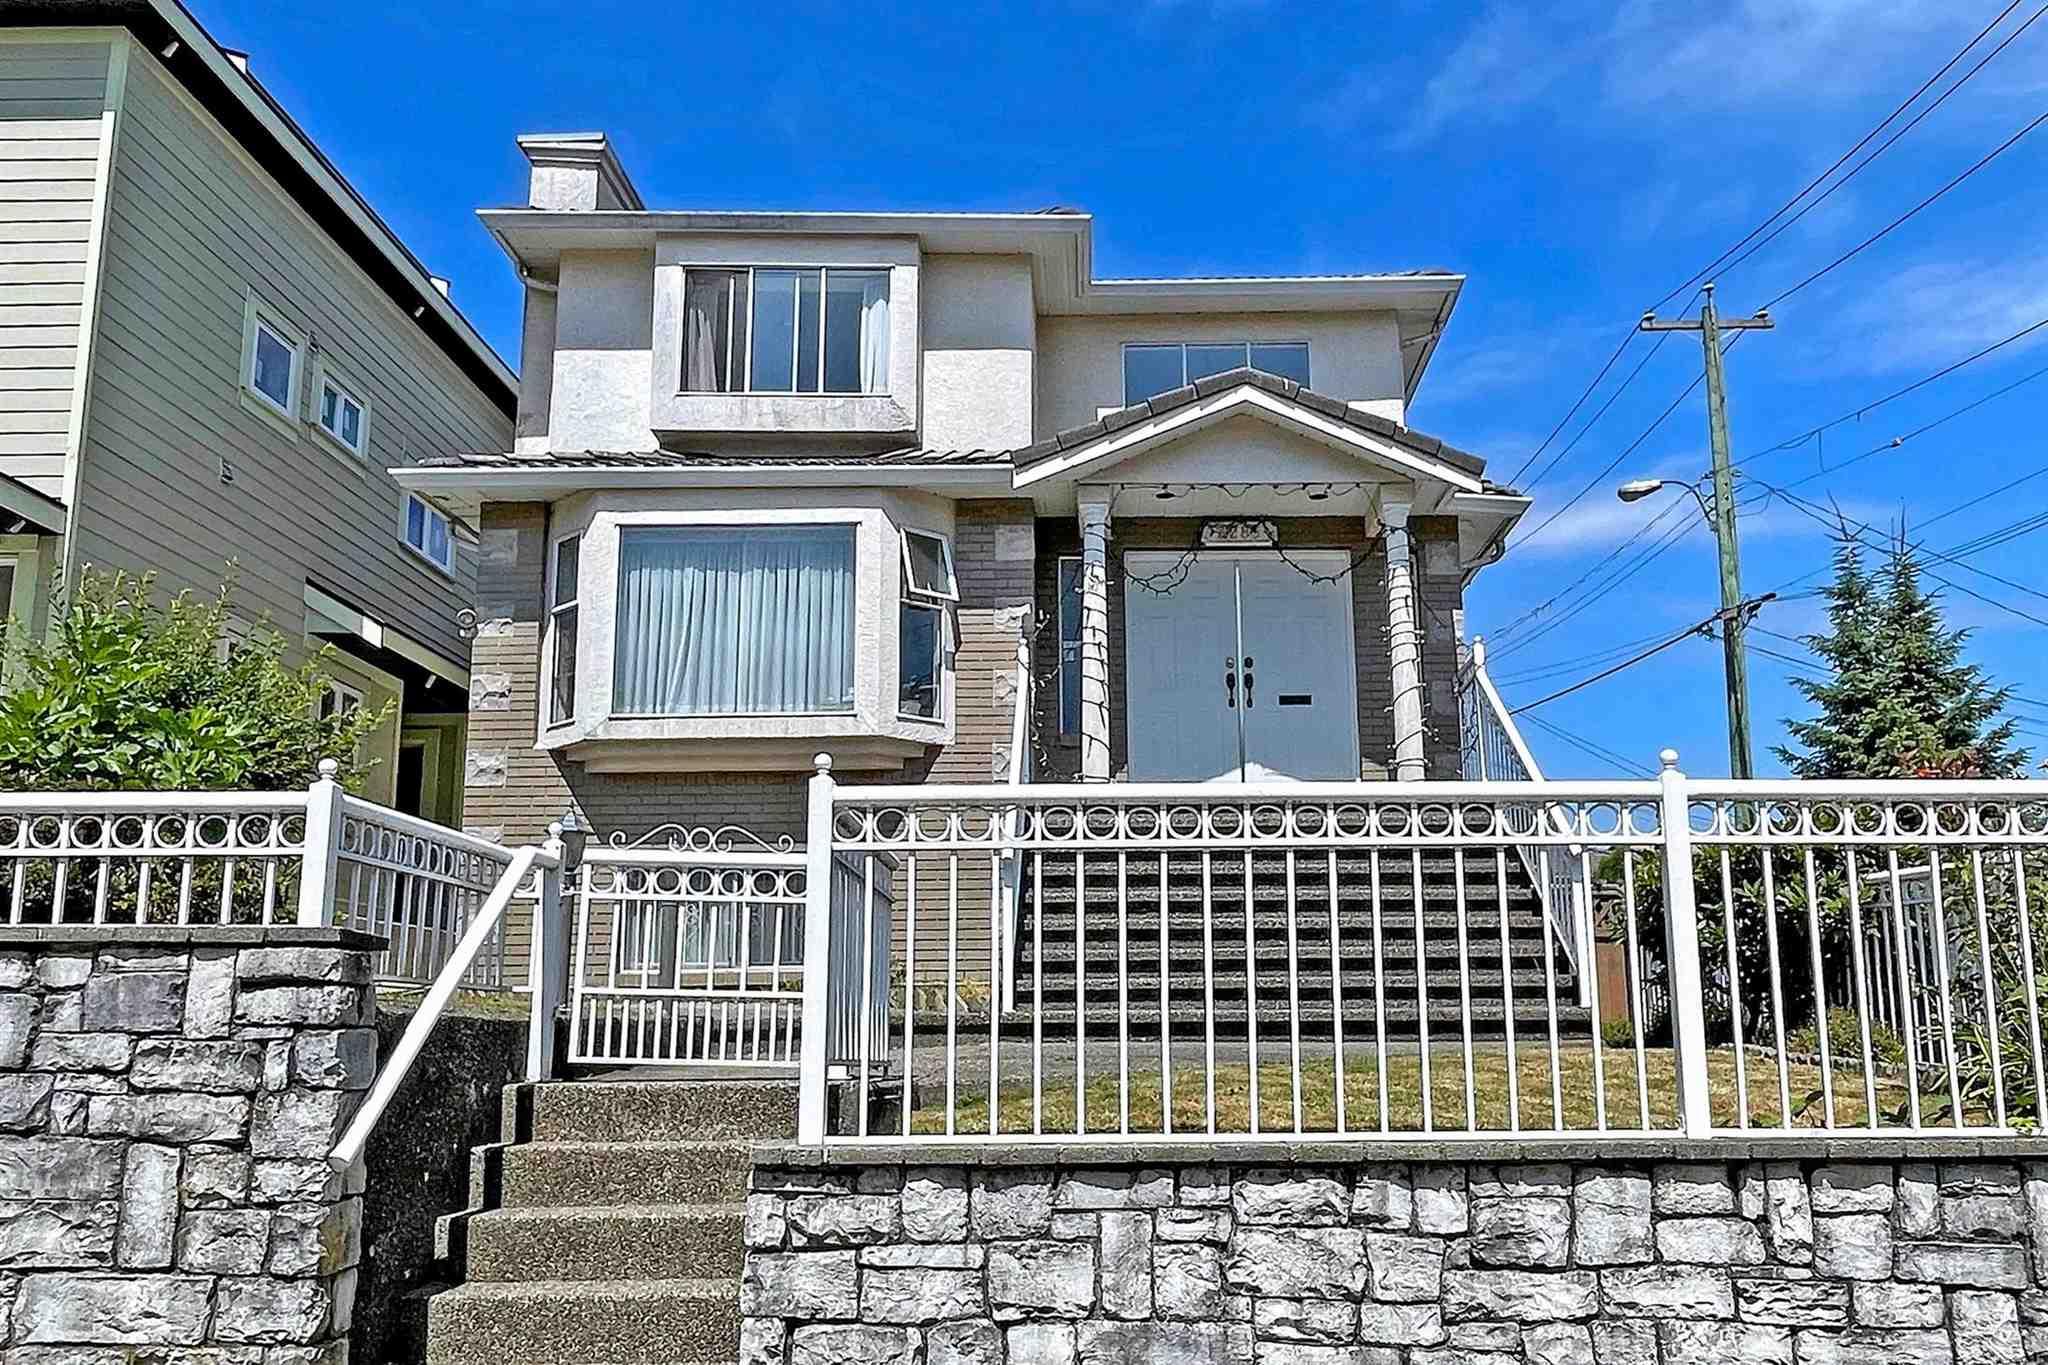 3289 E 7TH AVENUE - Renfrew VE House/Single Family for sale, 6 Bedrooms (R2603037) - #1